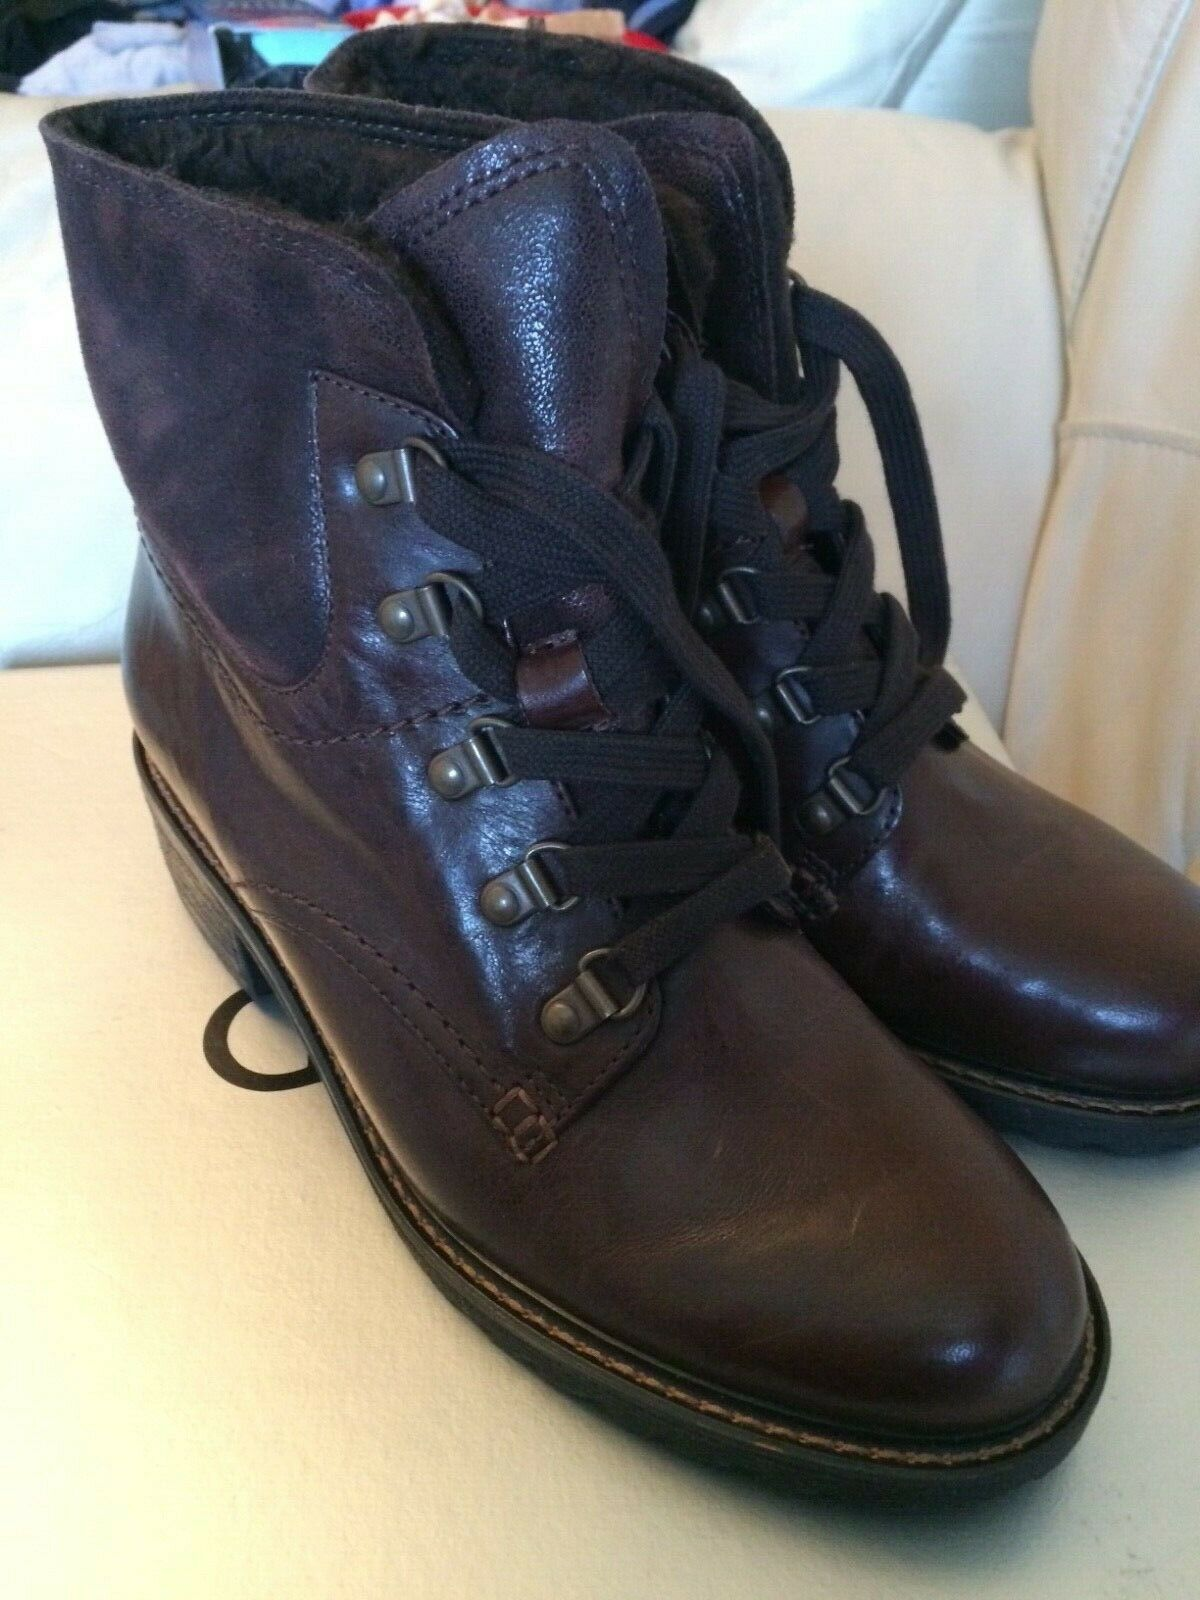 6cd932fab57ef New ancle boots 5.5 Gabor. Men's Ecco Melbourne Cap Toe Tie Leather Black  621704 ...